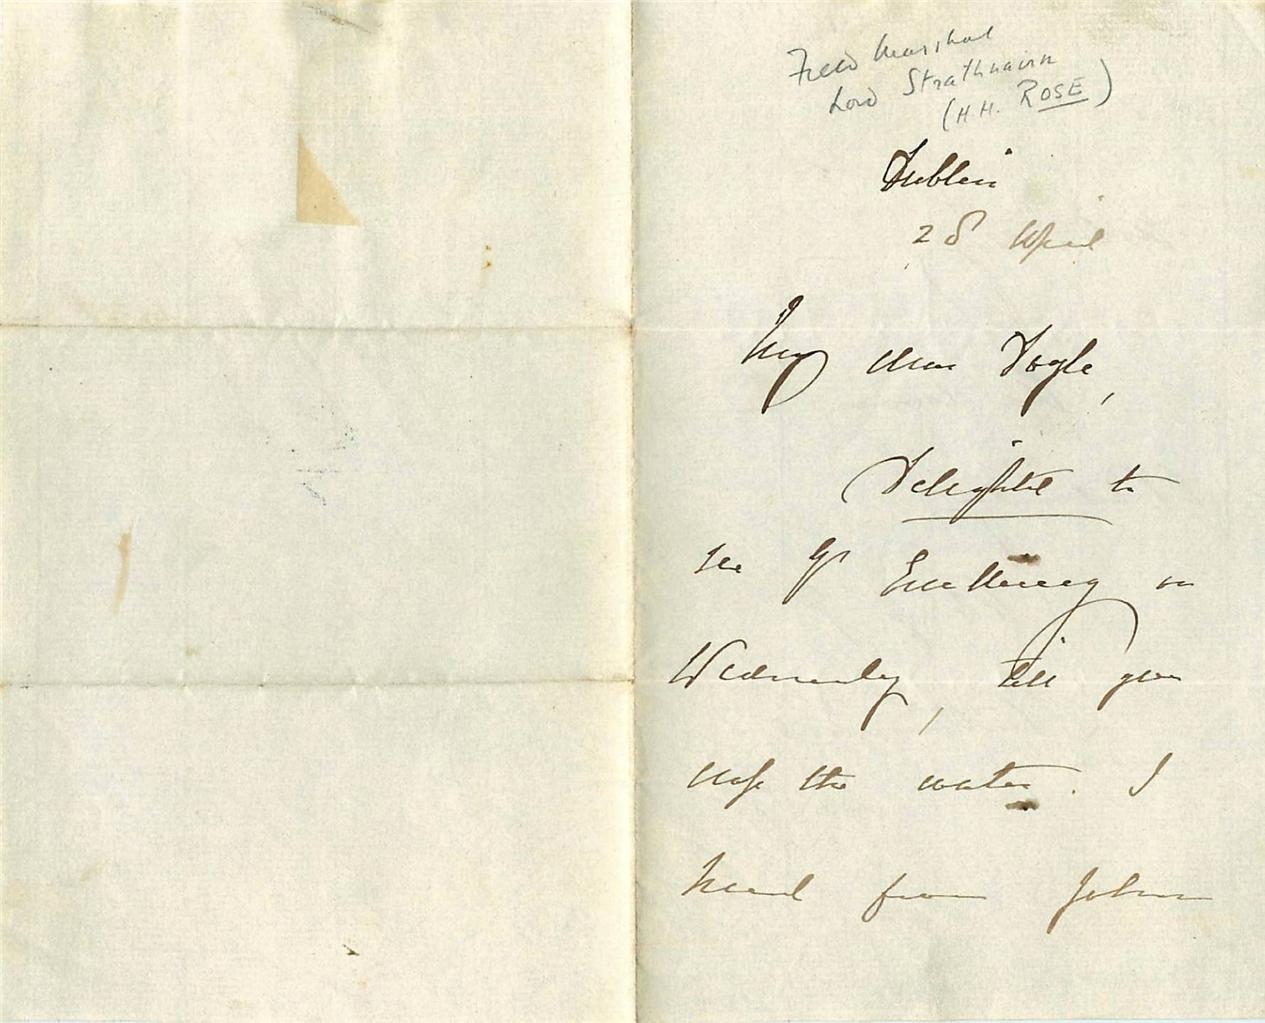 Vintage-Autograph-Letter-Field-Marshal-Hugh-Henry-Rose-1st-Baron-Strathnairn